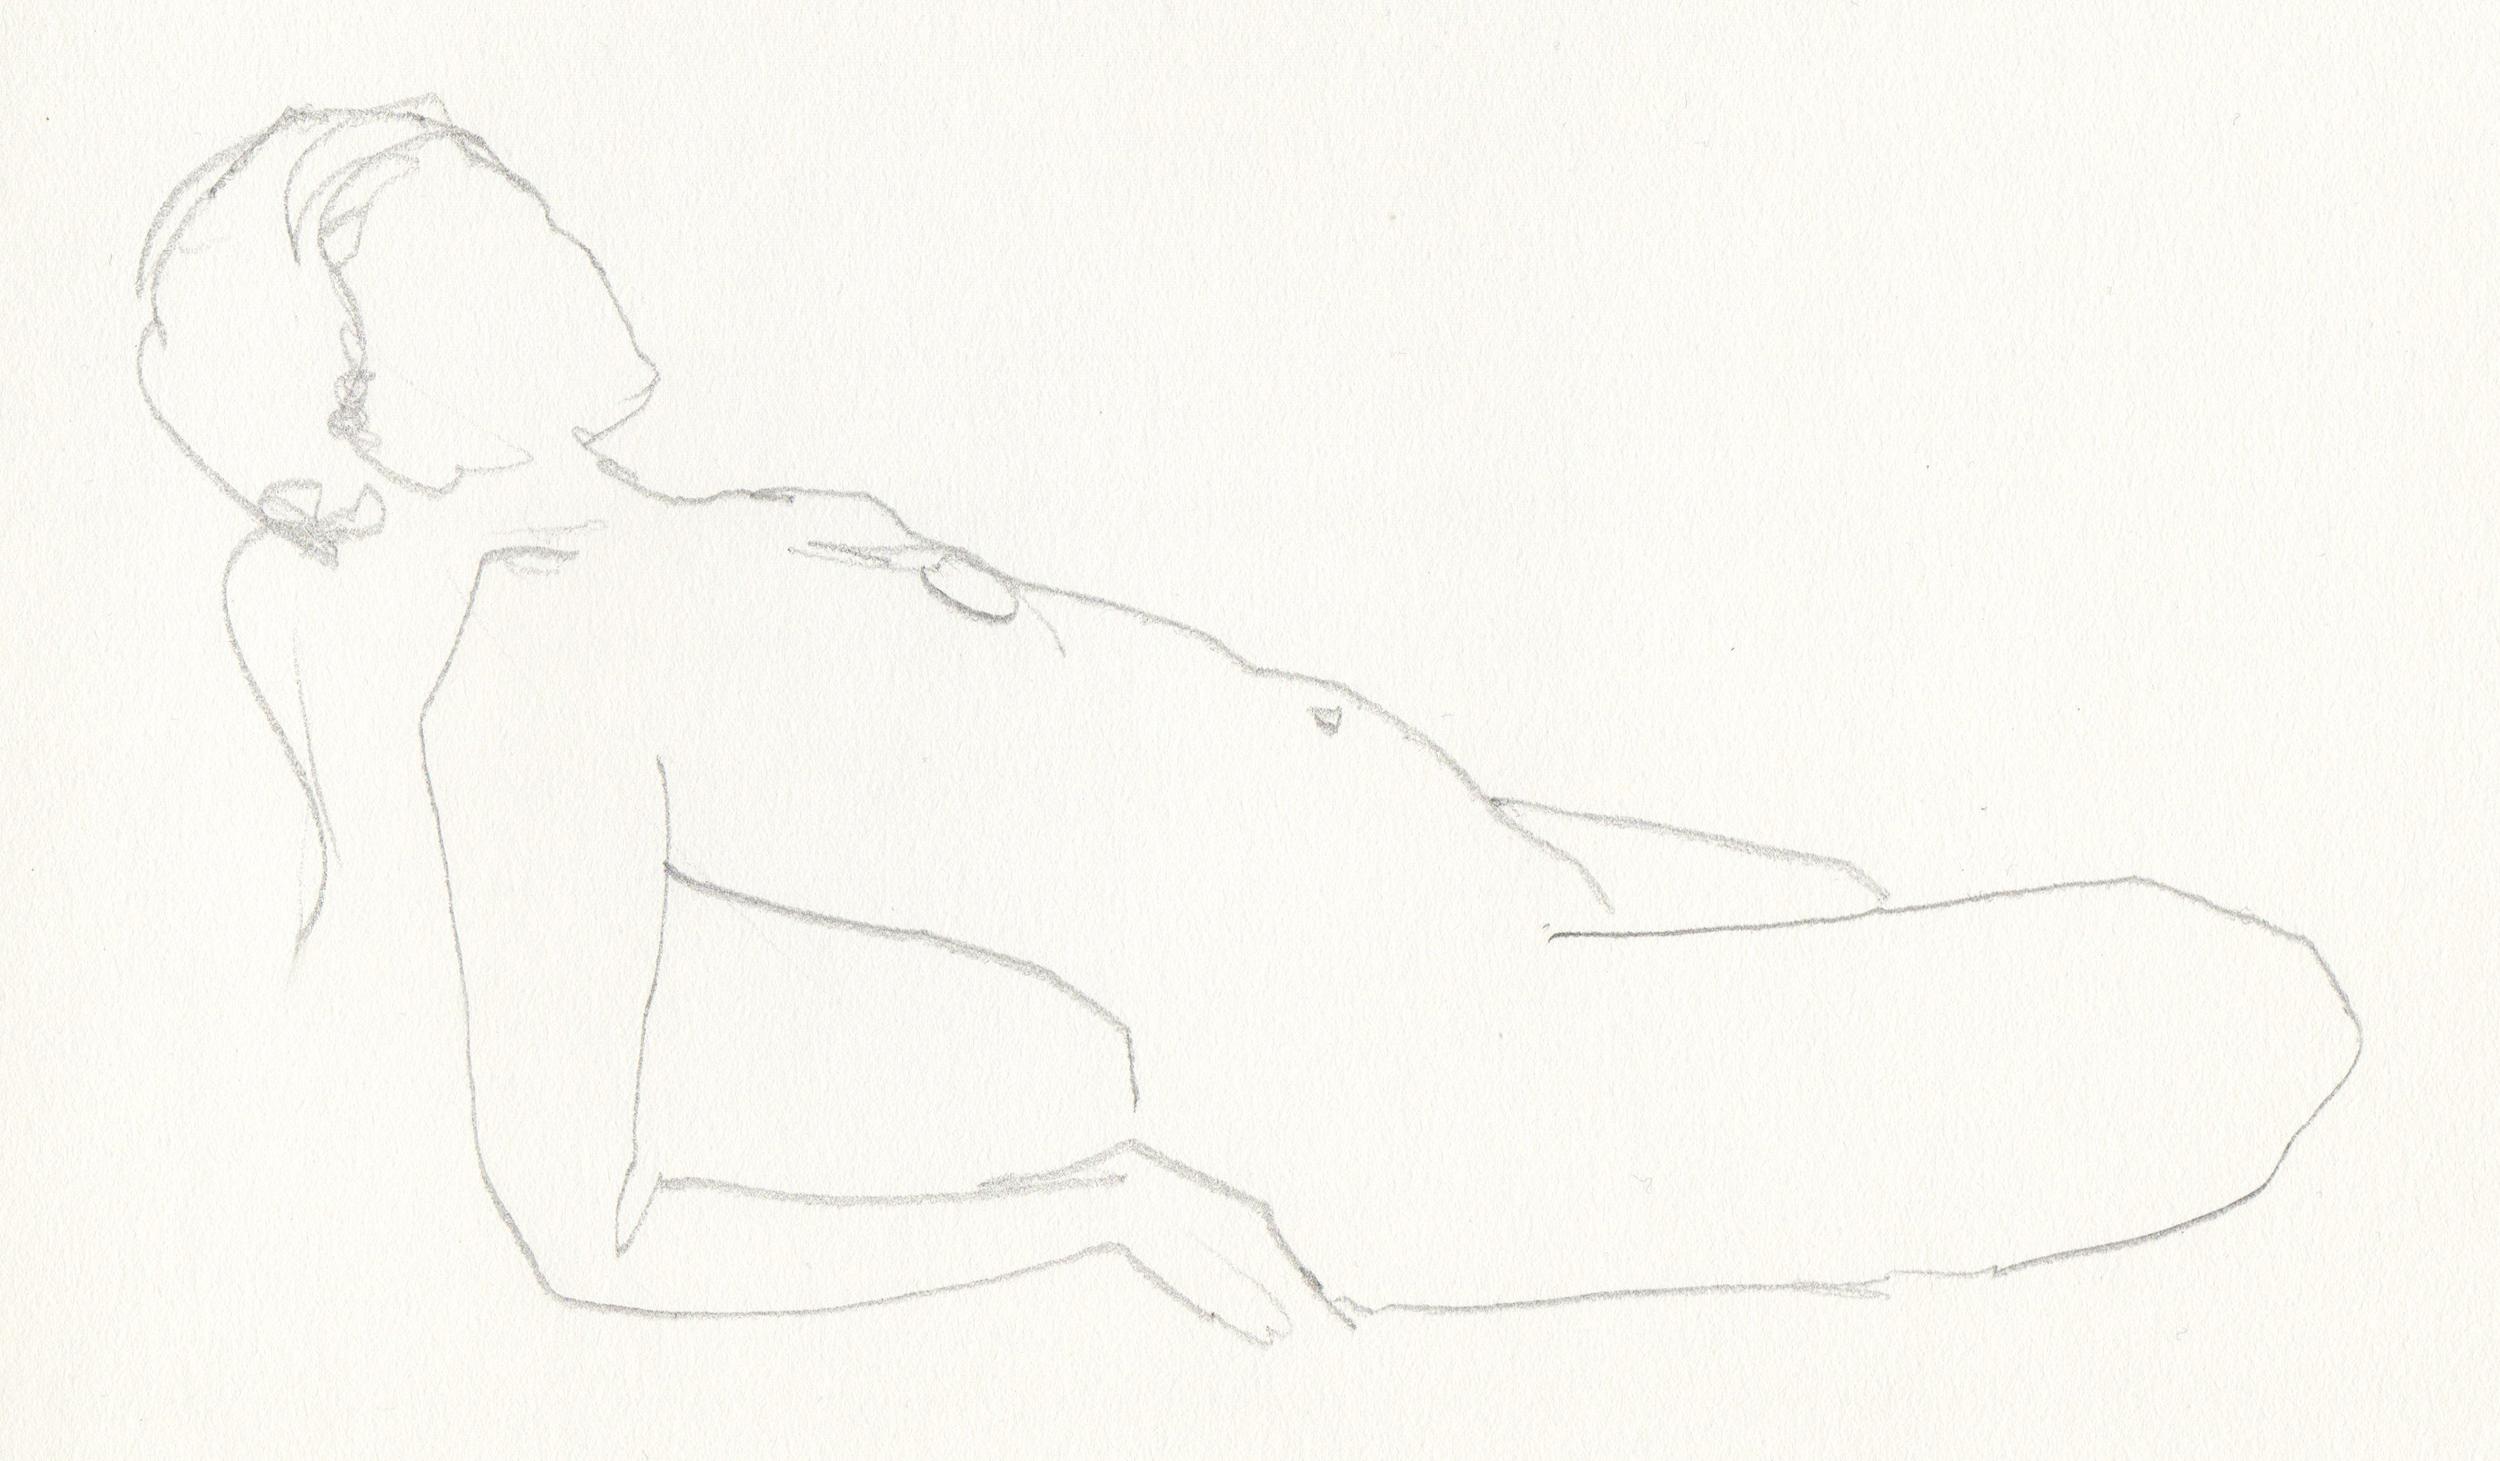 2012_Sketch_F-Beudin_030